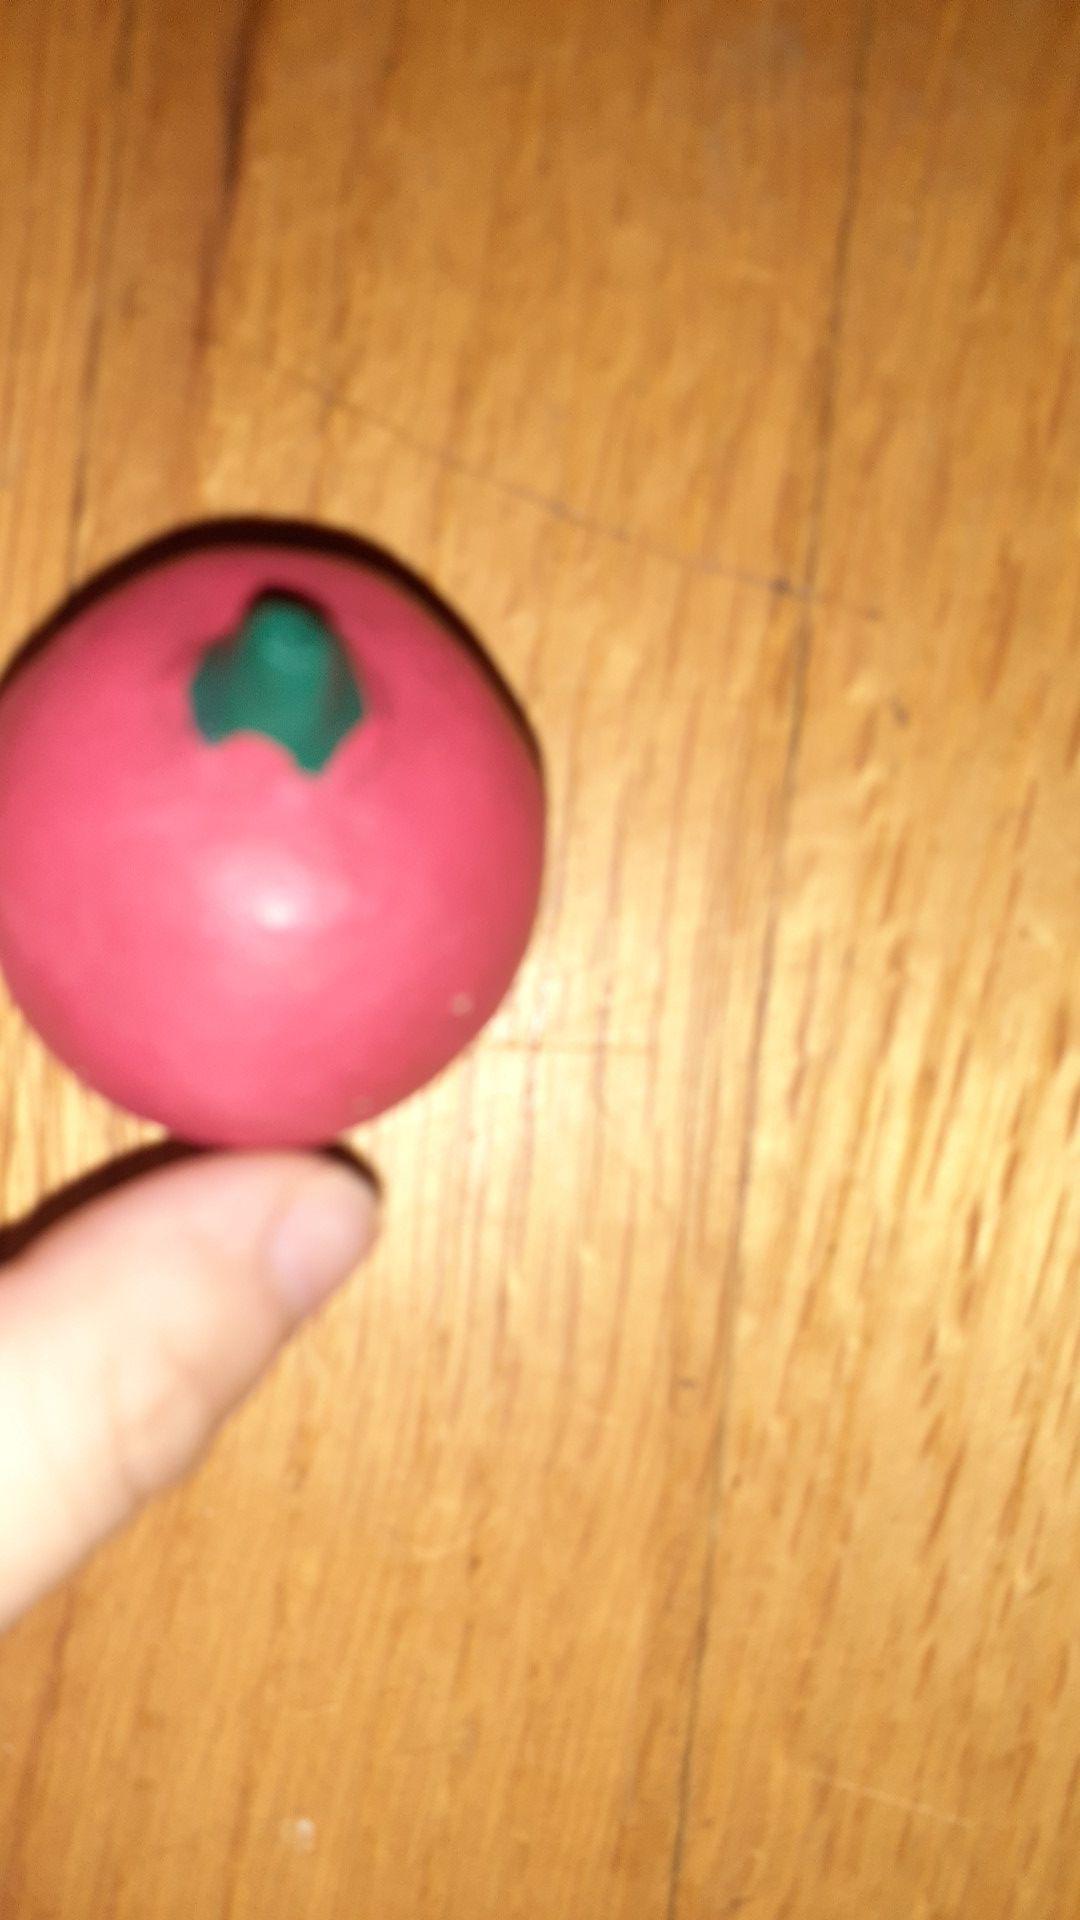 Apple clay